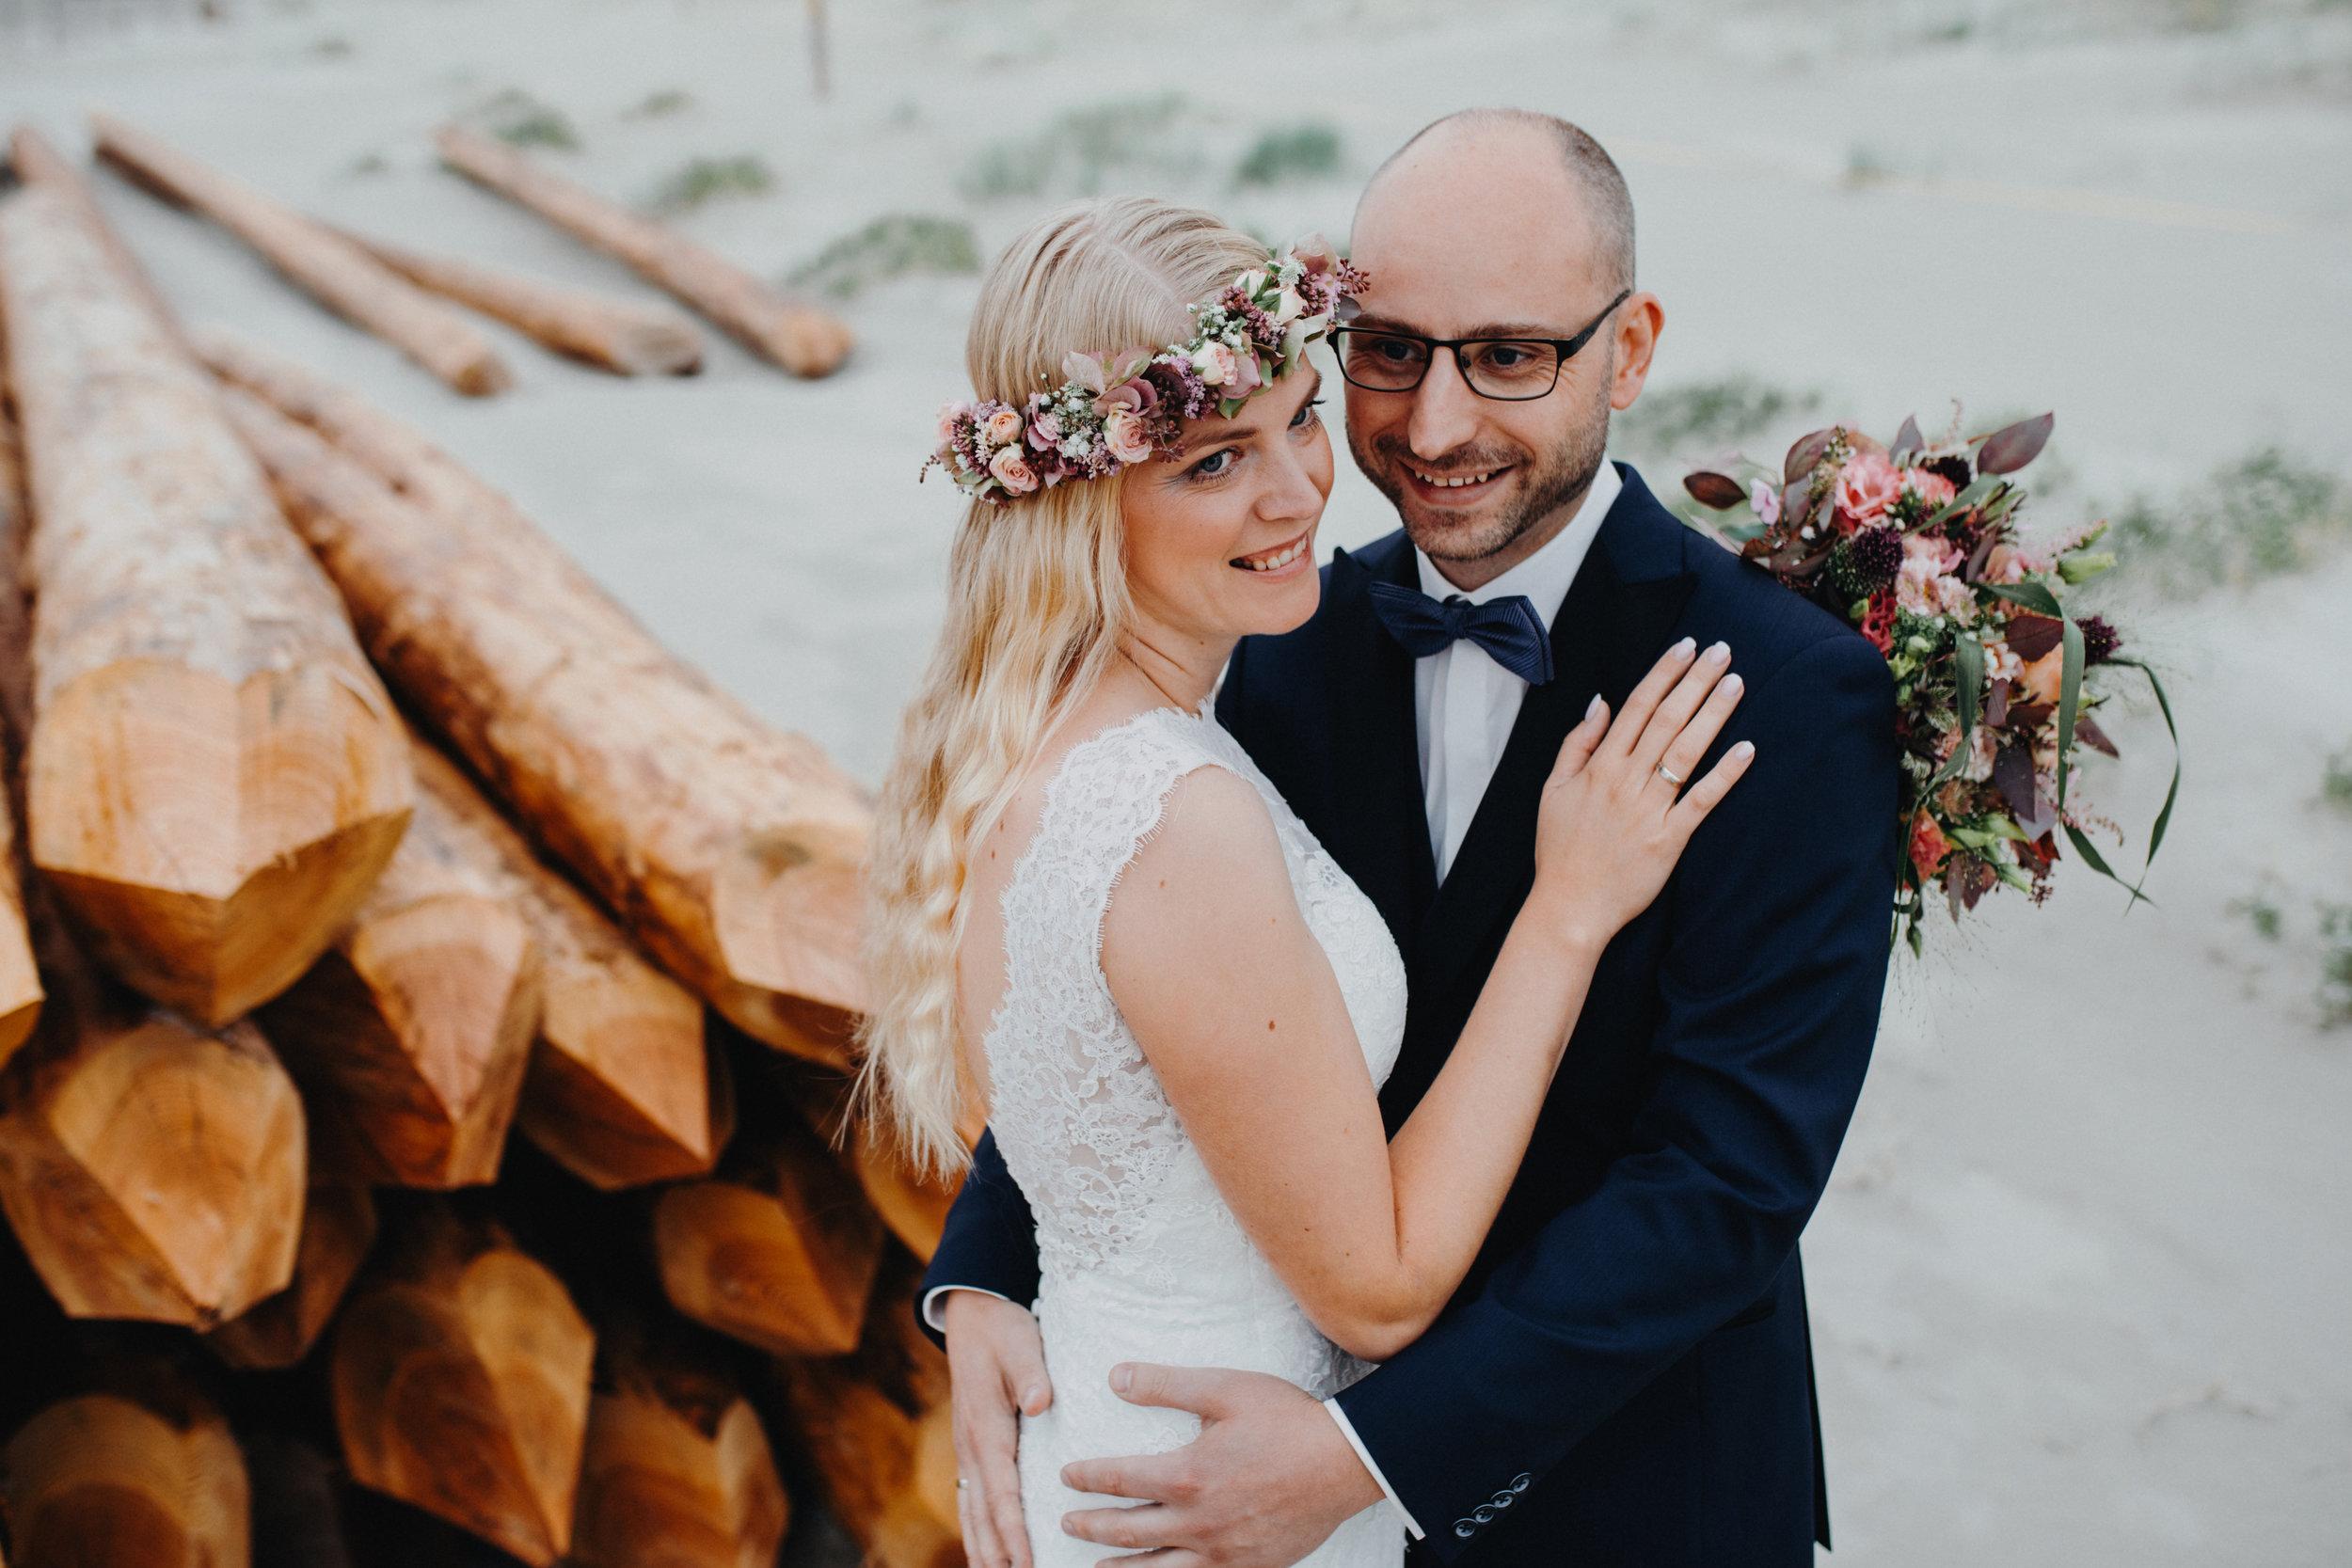 Hochzeitsfotograf - Sankt Peter Ording - Heiraten